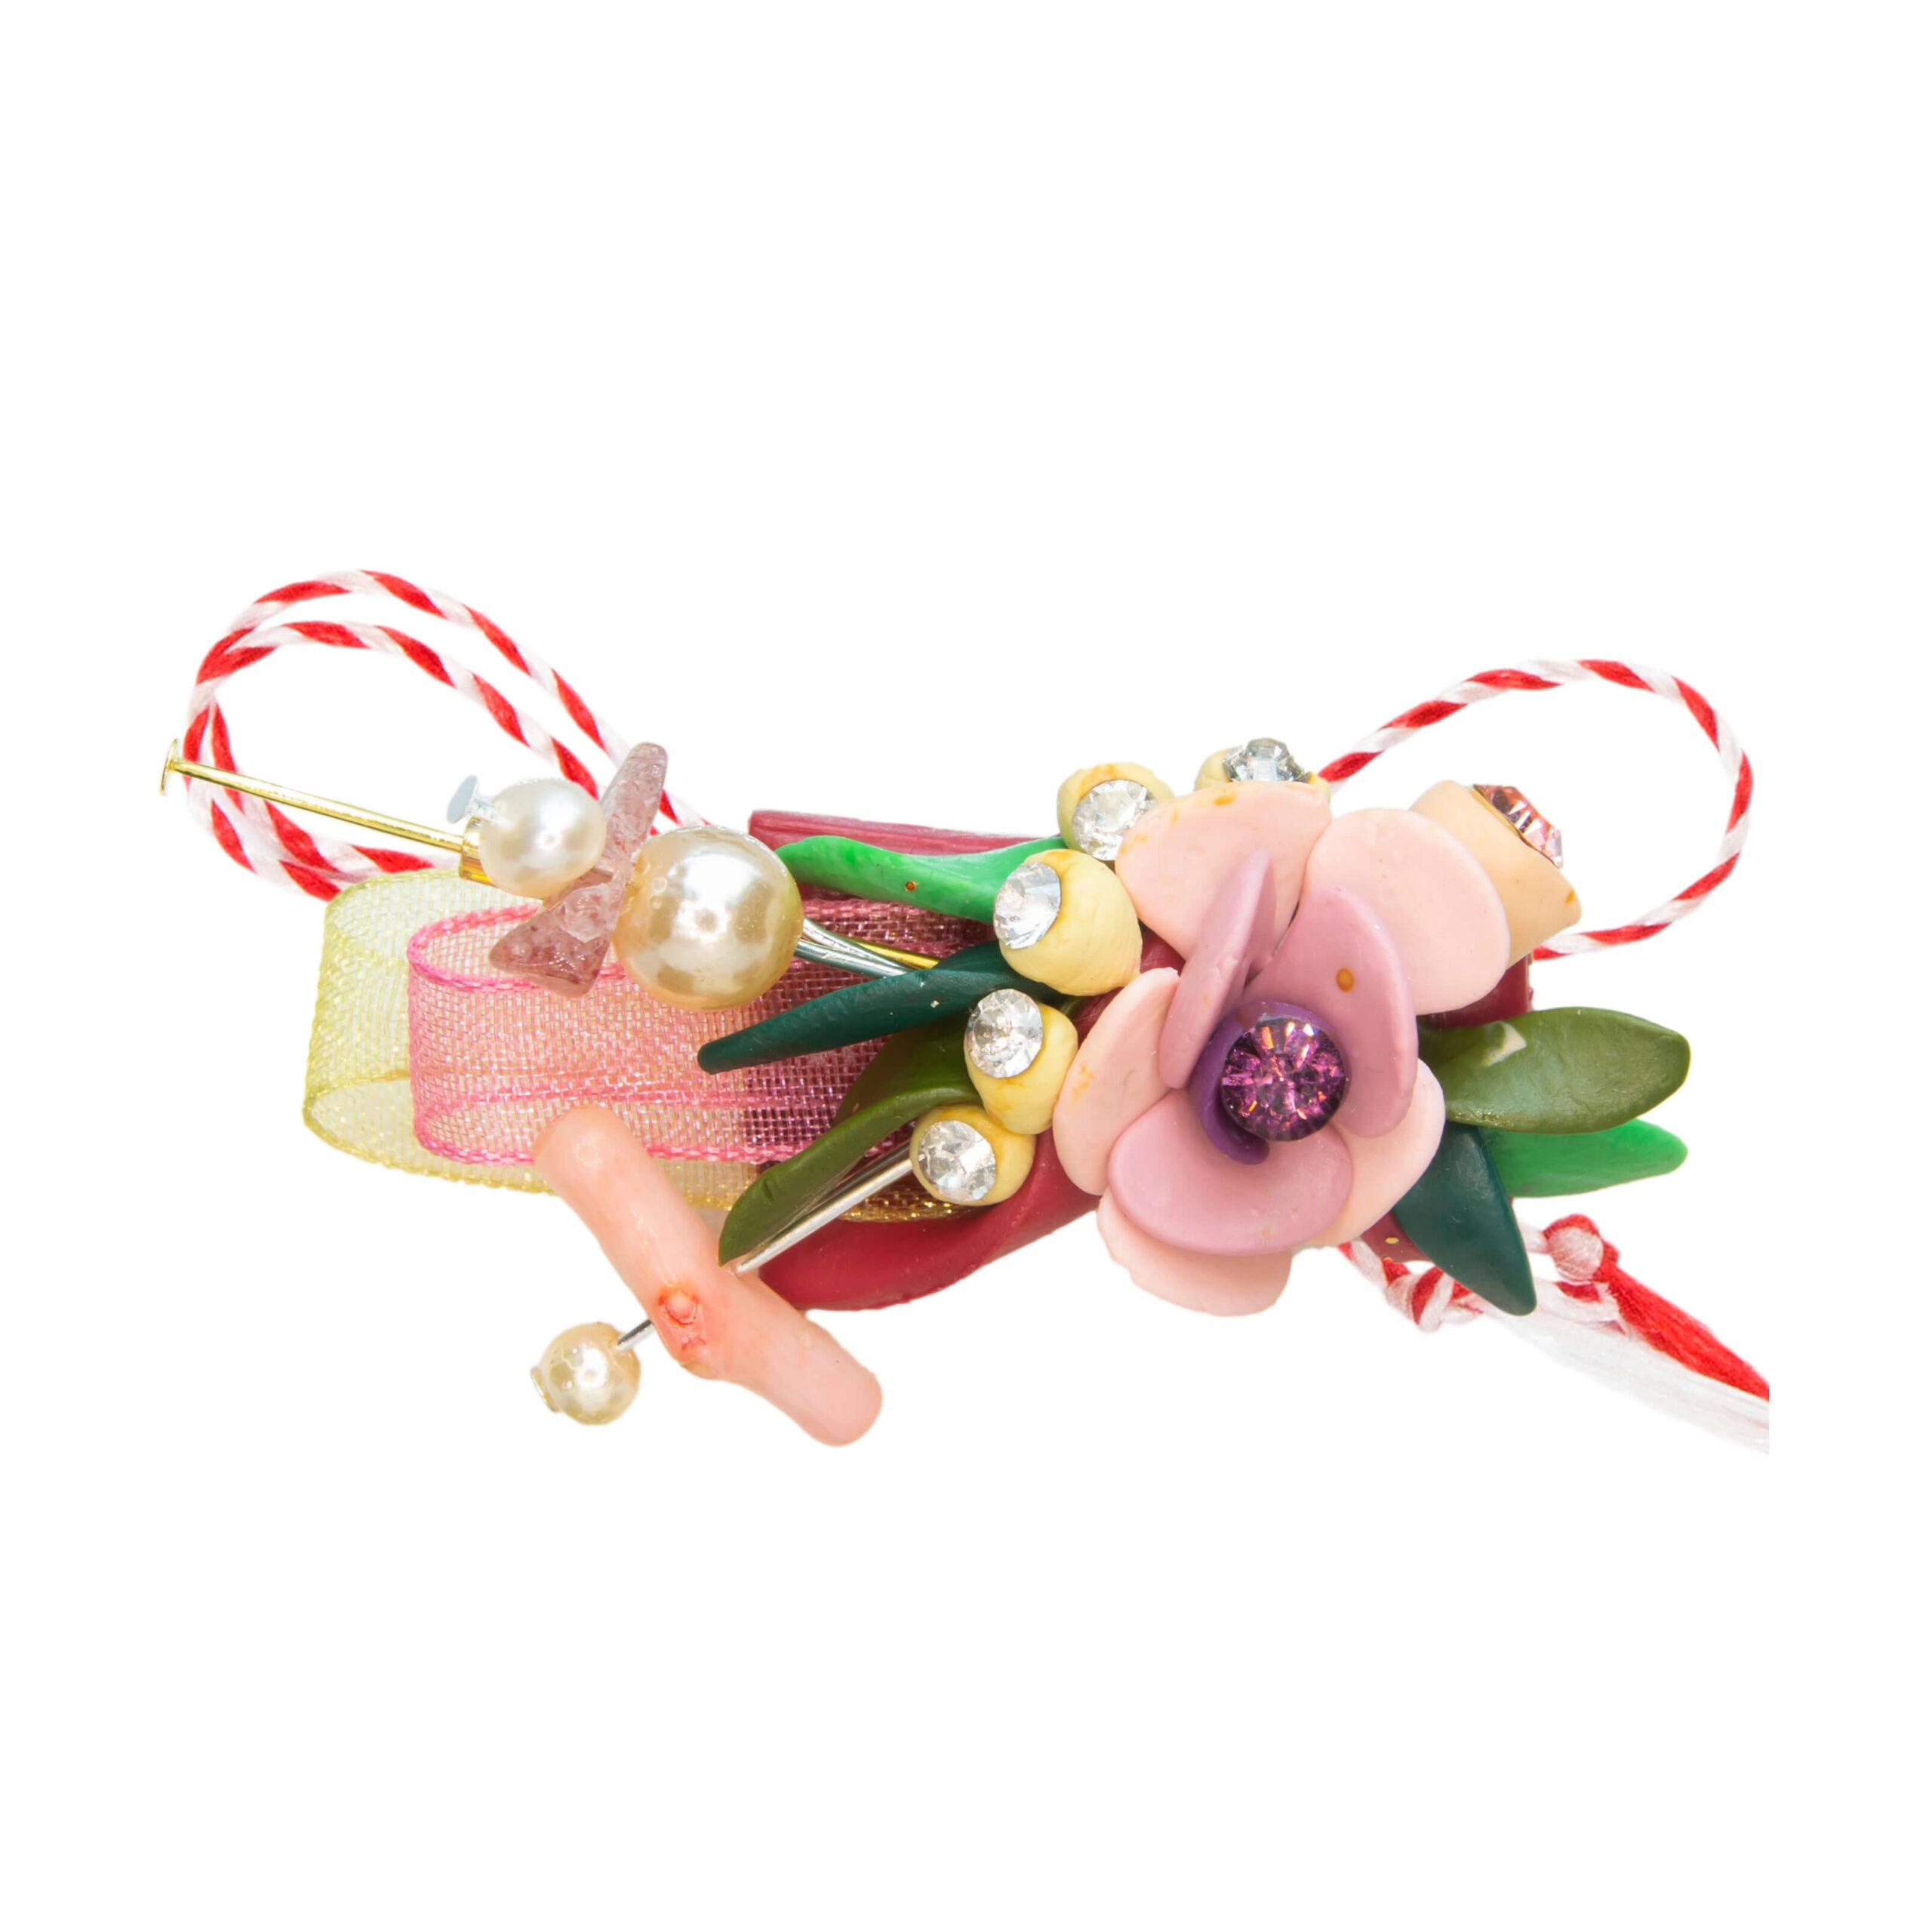 Martisor brosa buchet flori, Miidefloriart, model 66